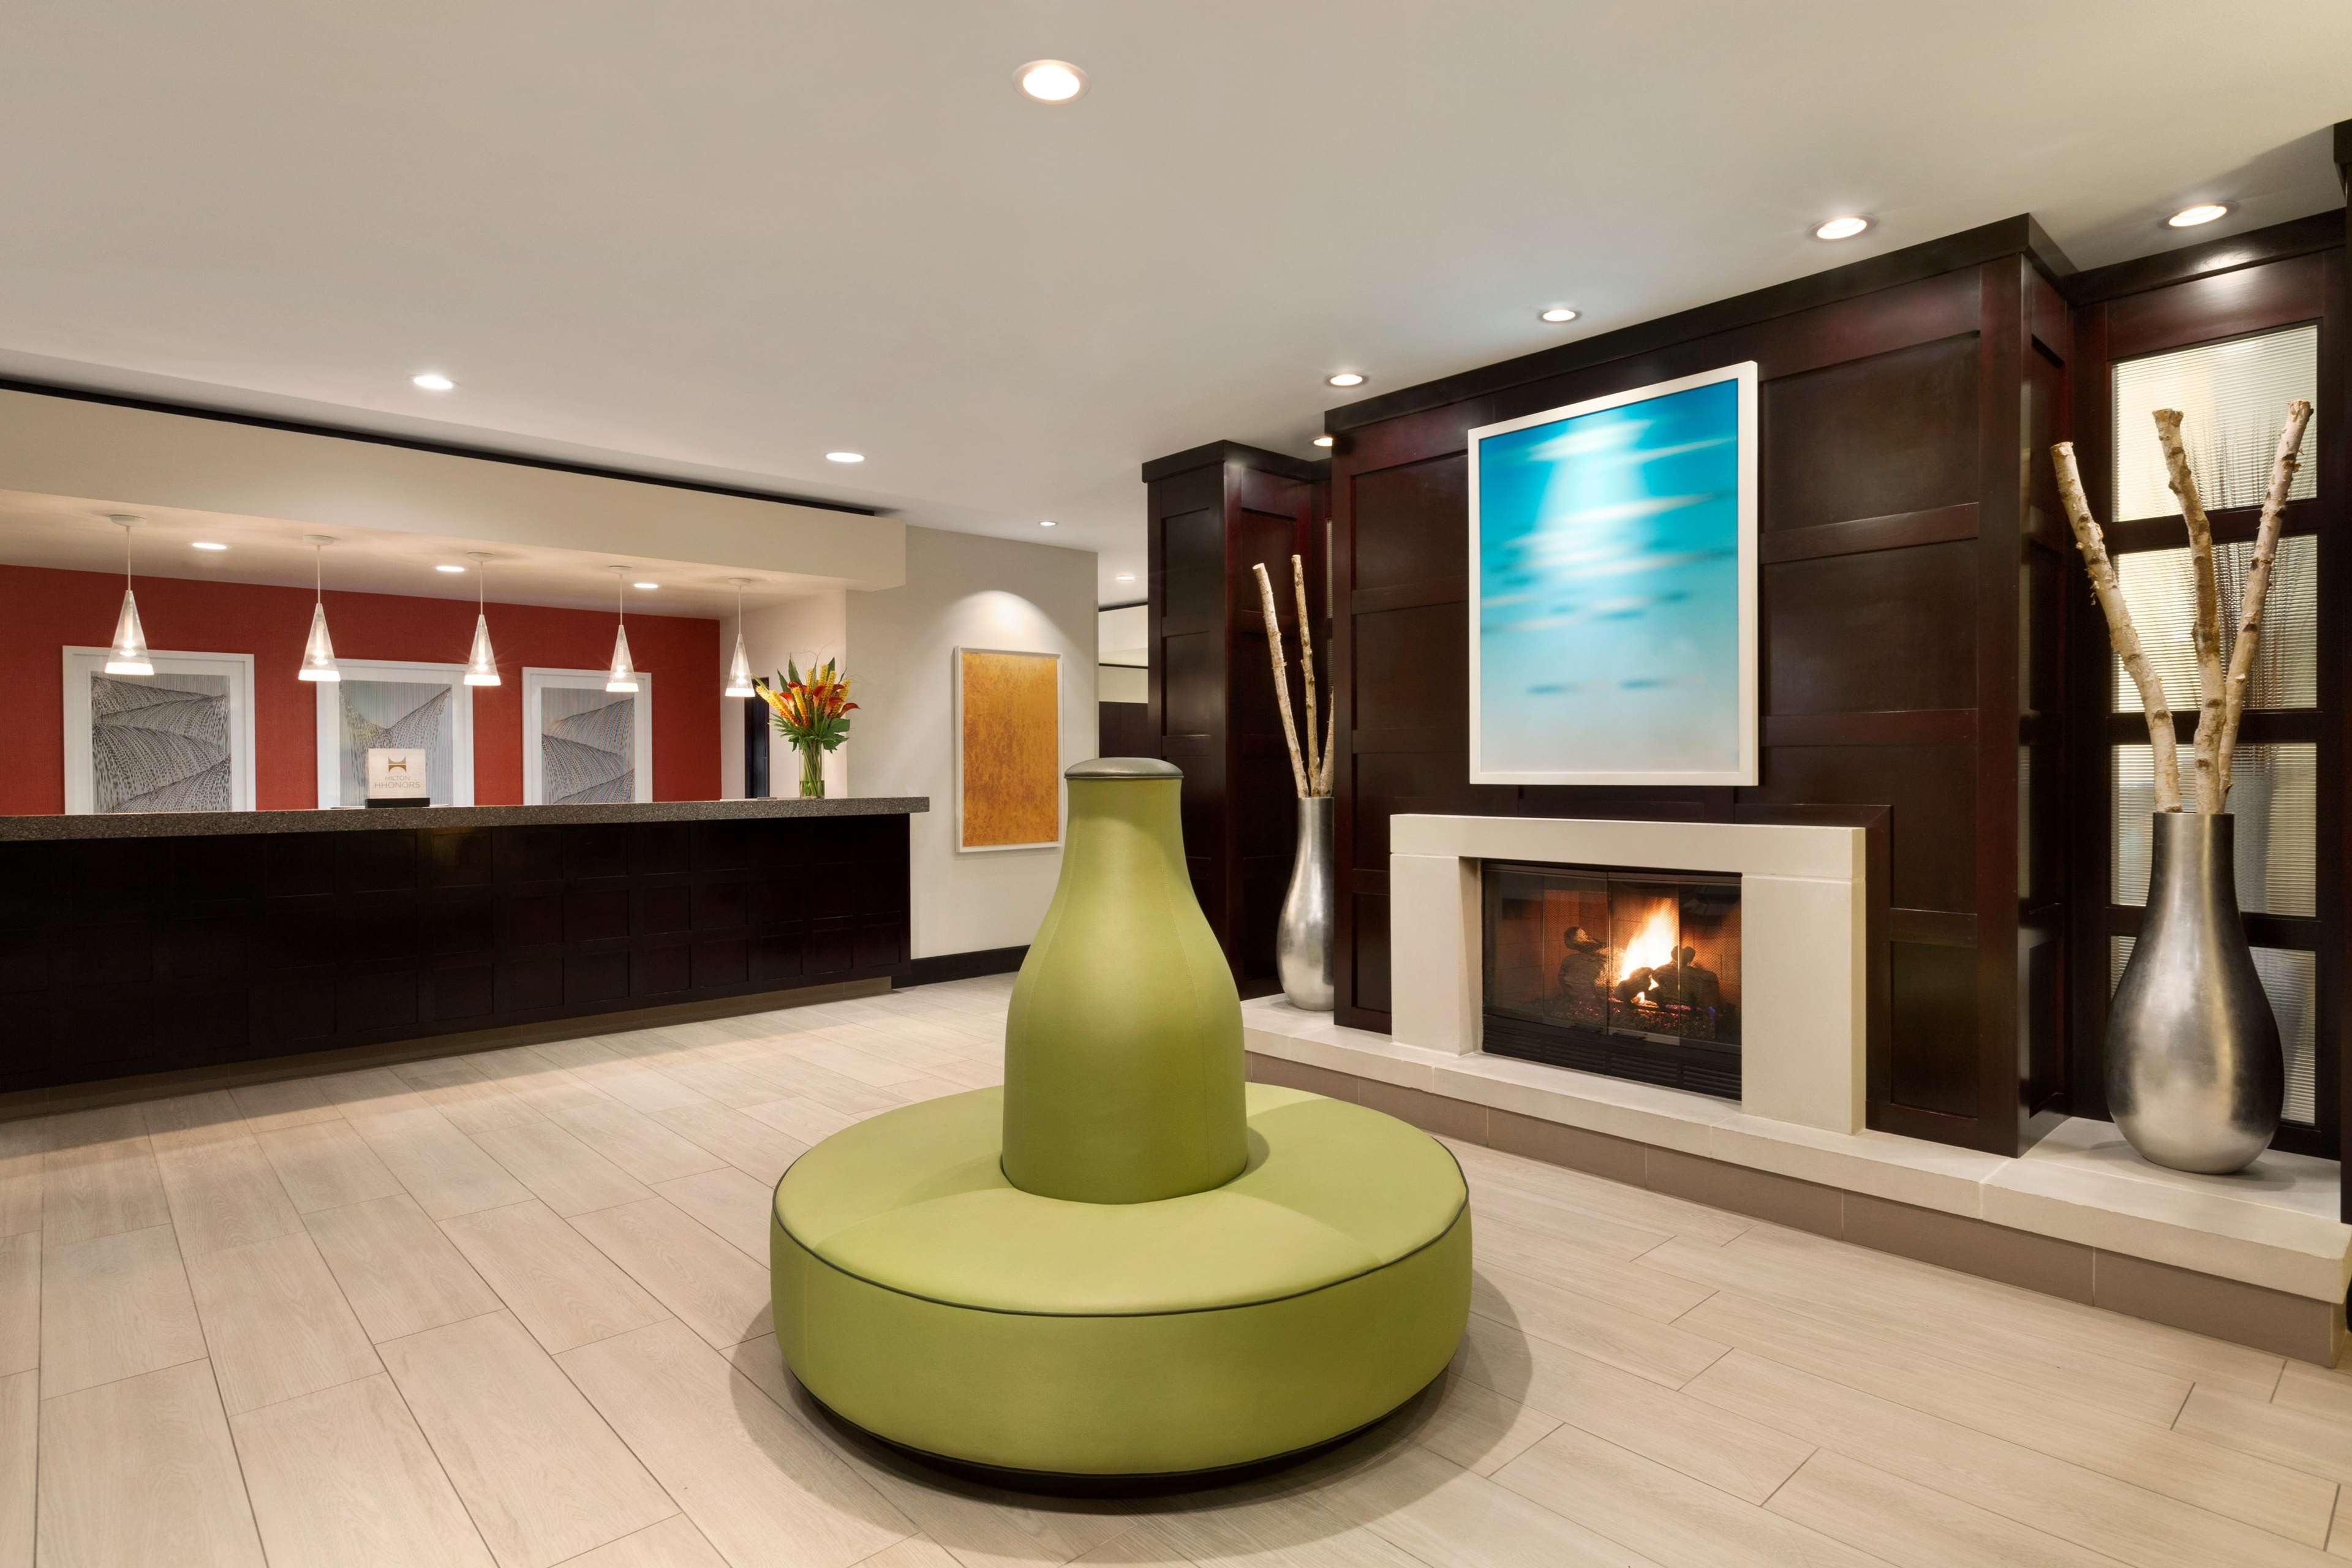 Homewood Suites by Hilton Plano-Richardson image 34